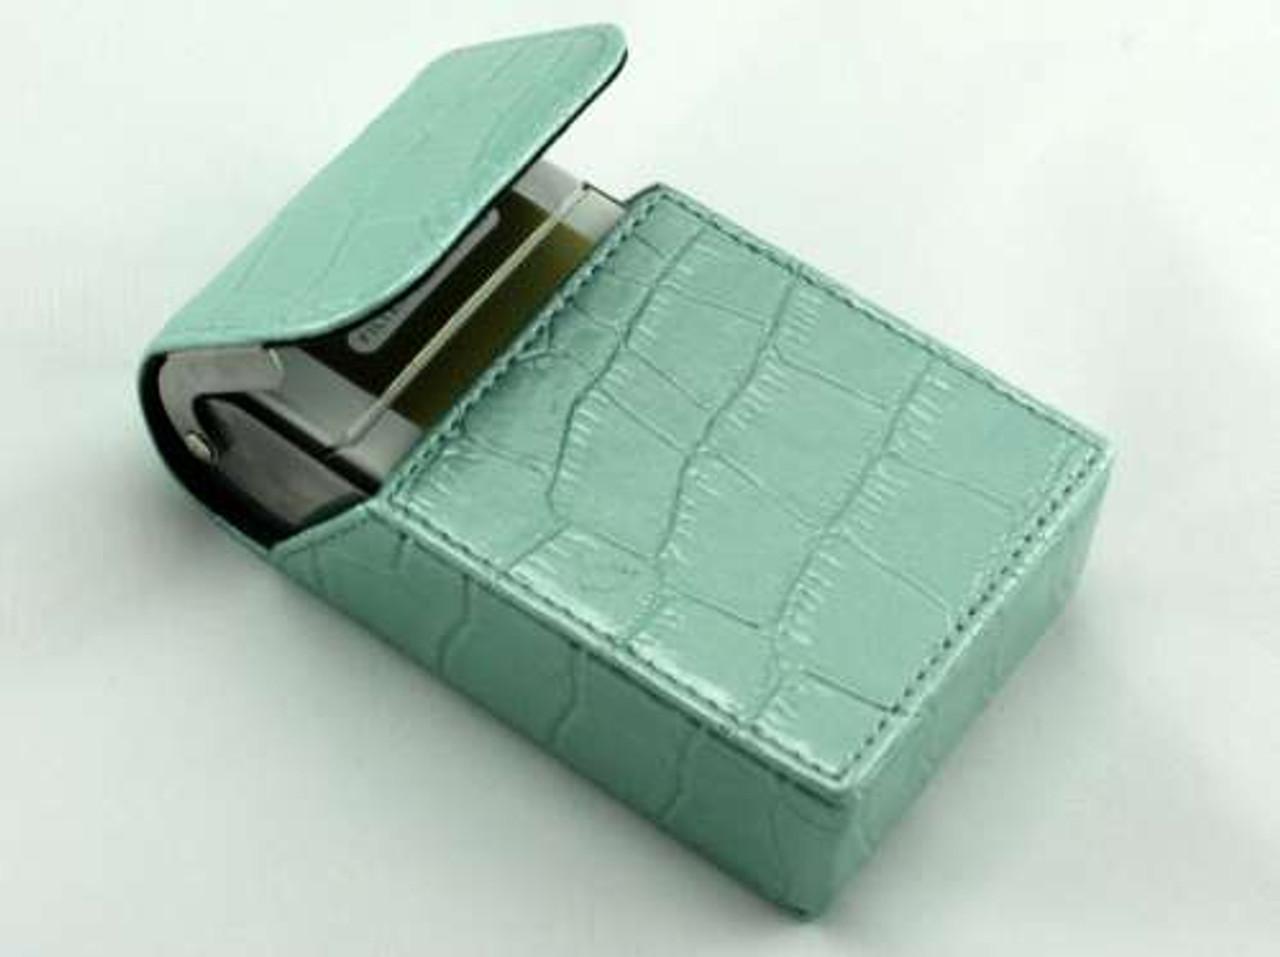 Turquoise Crocodile Cigarette Pack Holder